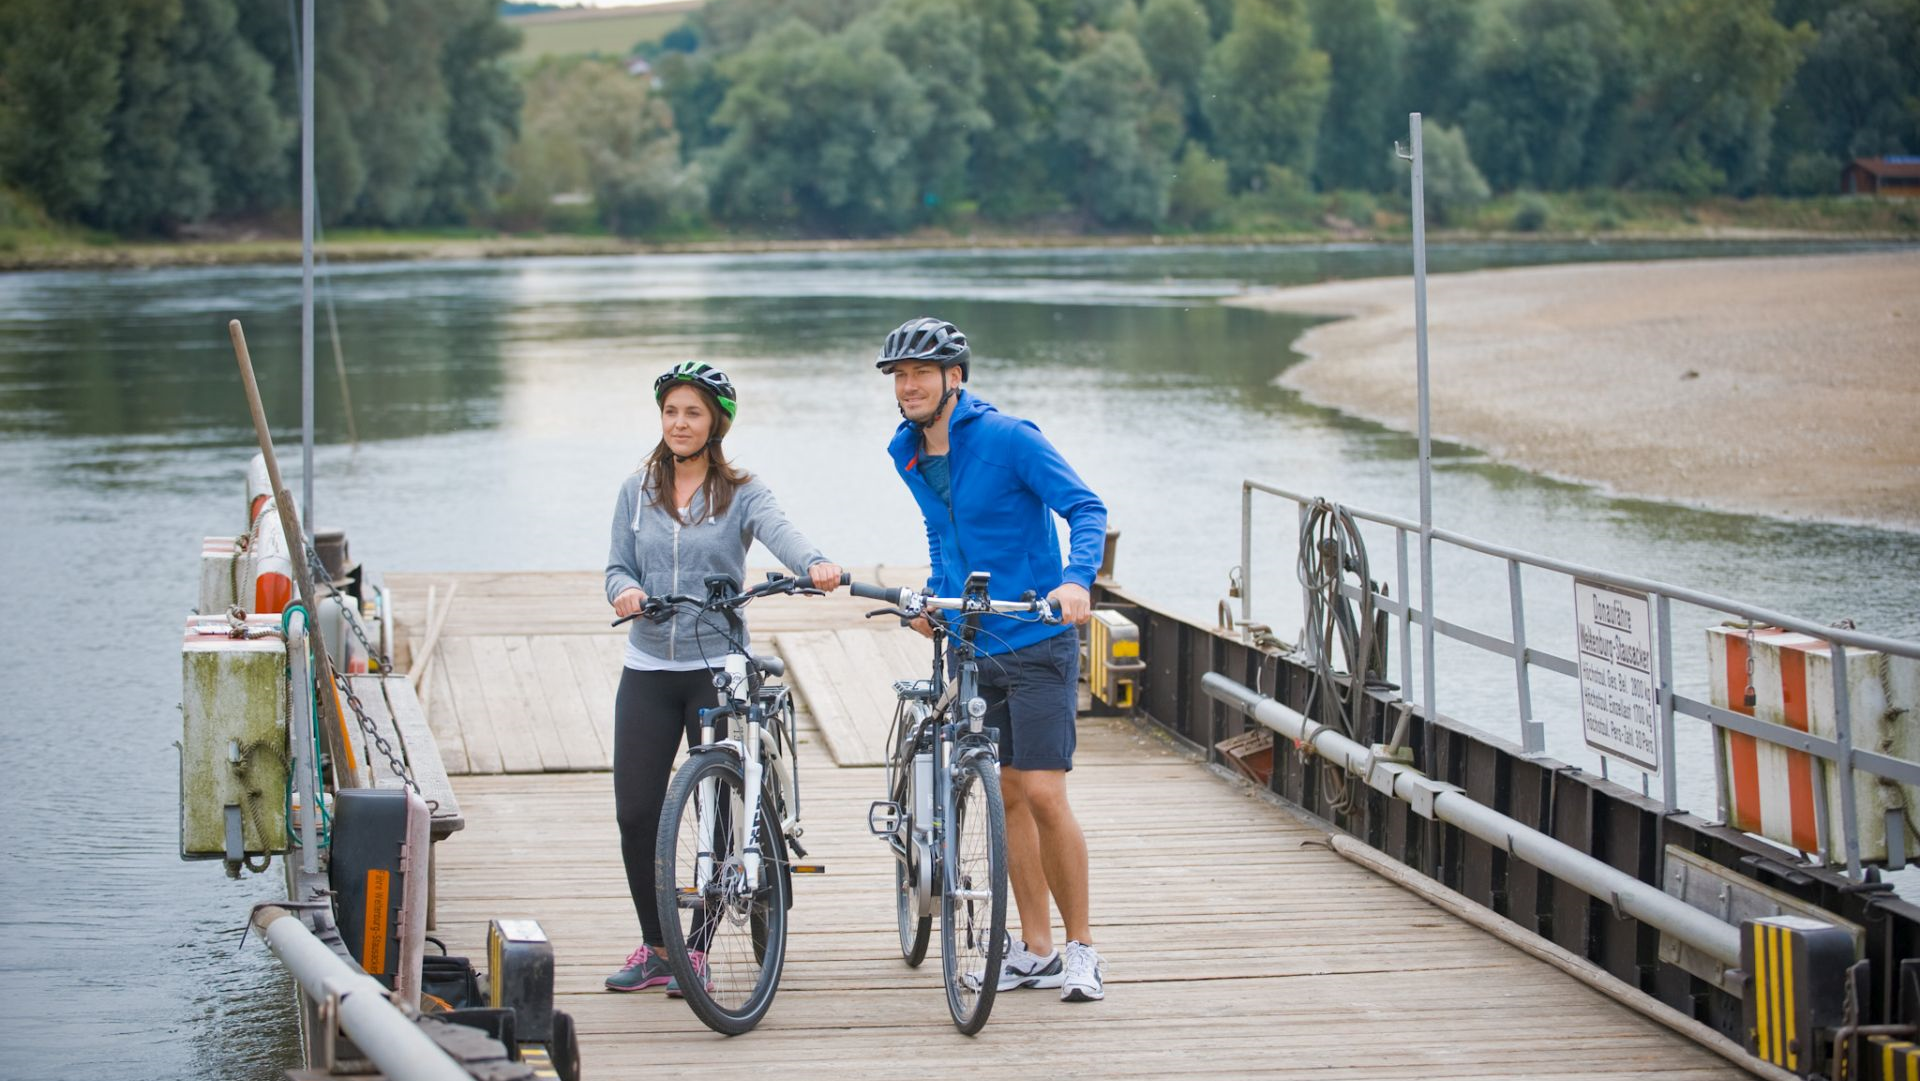 Radeln auf dem Donauradweg